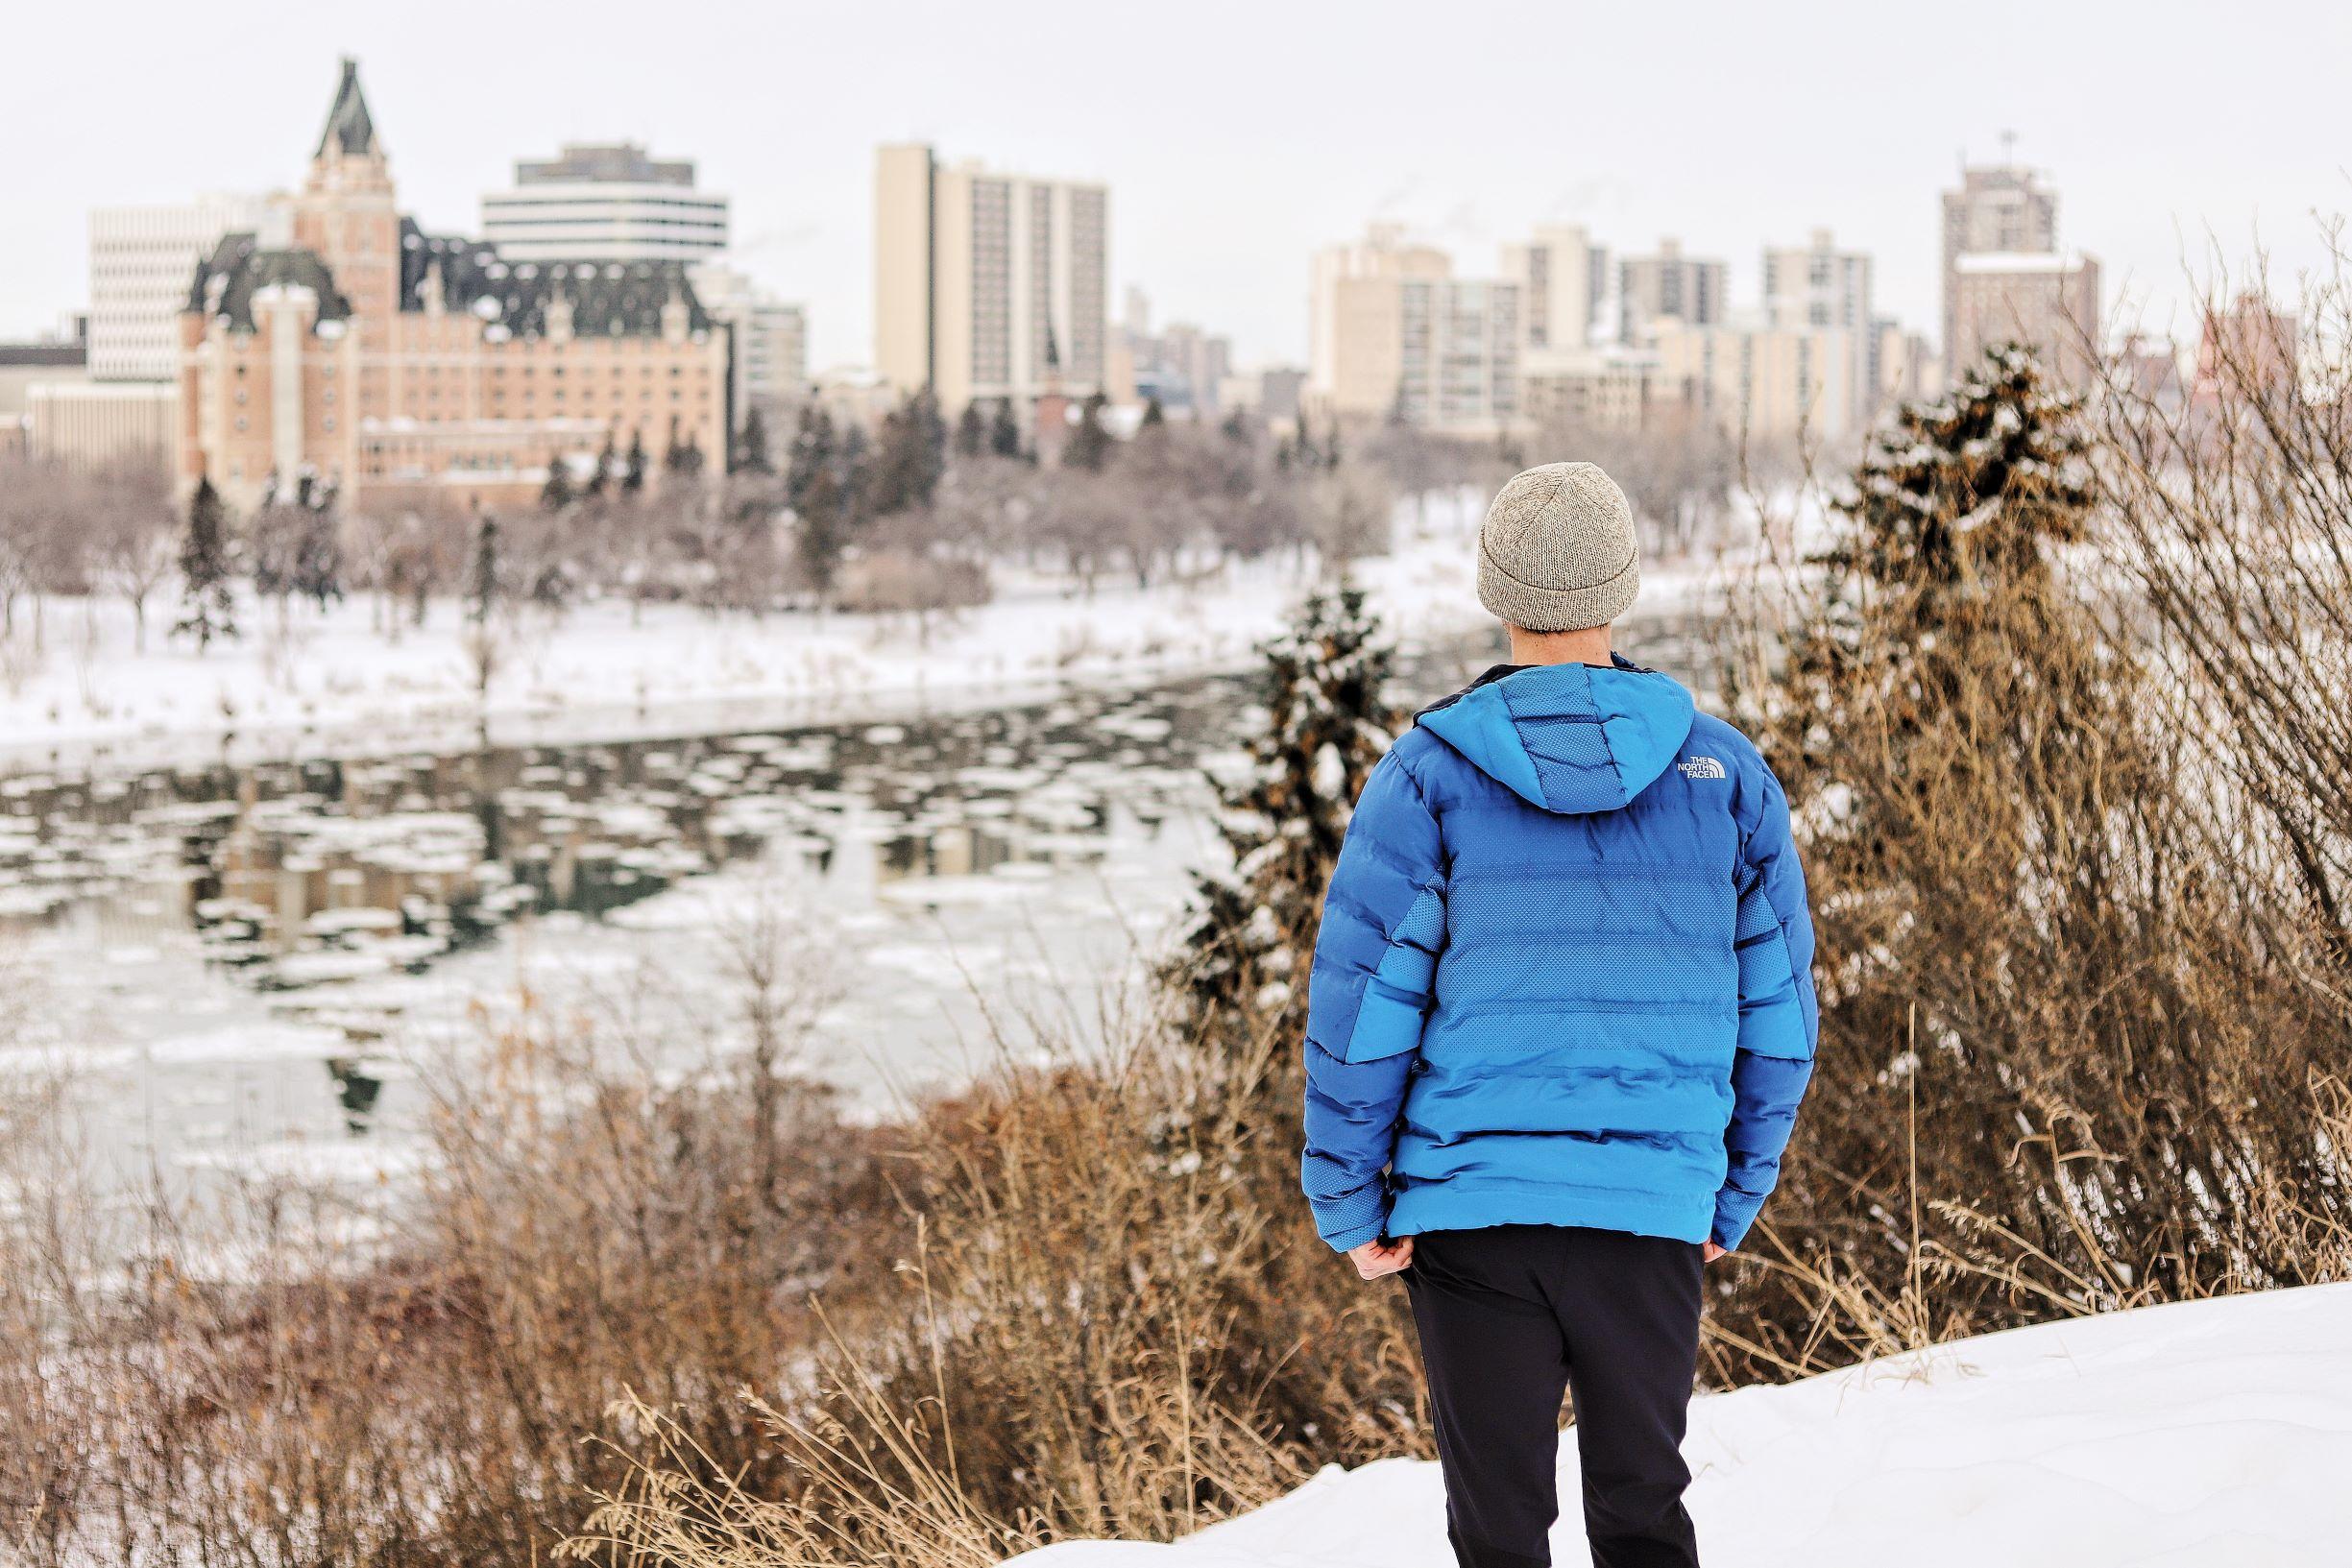 LeClair Media Commercial Photography Shoot Saskatoon, winter lifestyle photography shoot for Ground Yoga